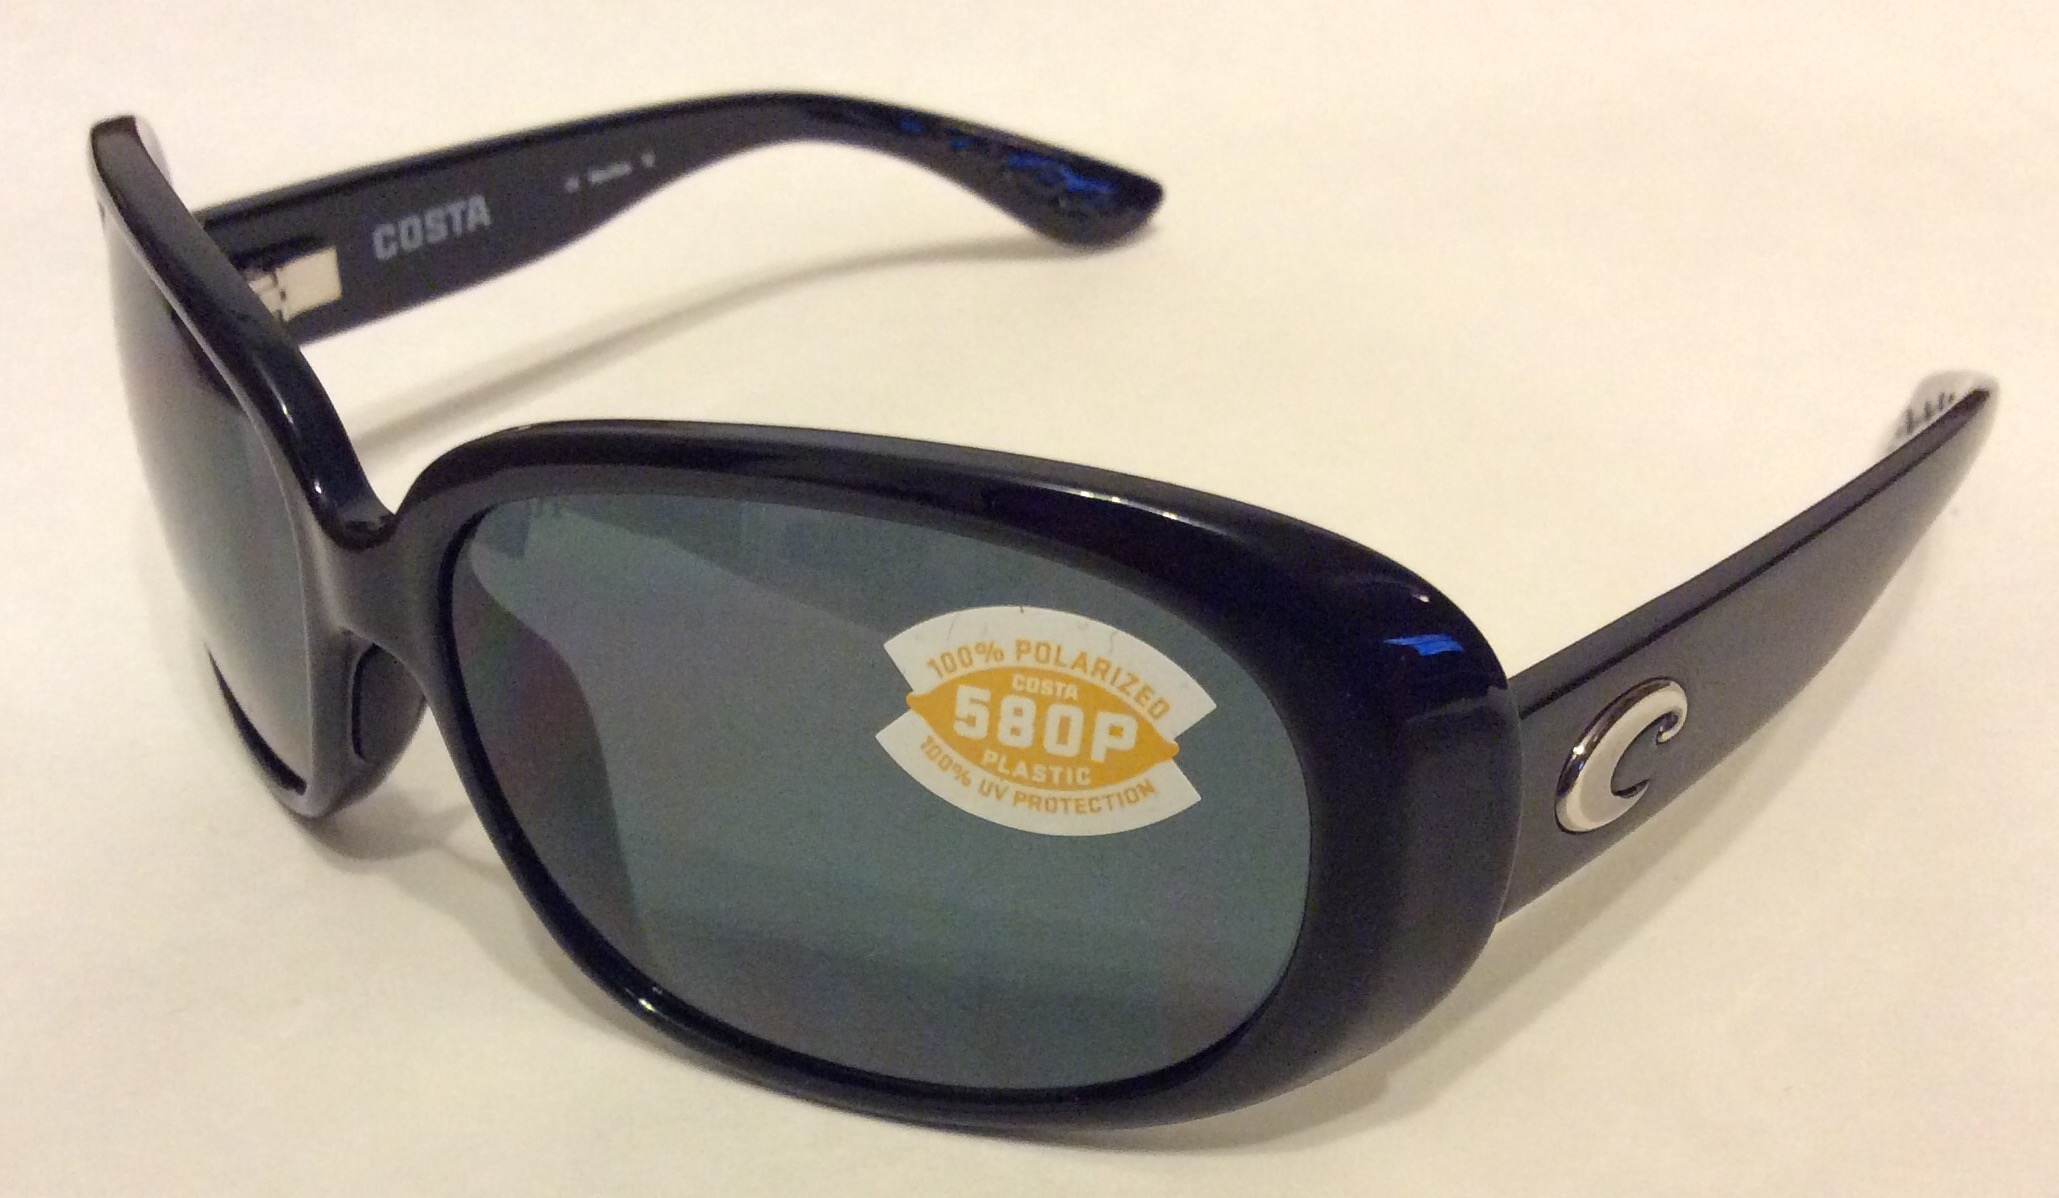 costa del mar hammock sunglasses   black   polarized gray 580p costa del mar hammock sunglasses  u2013 black frame  u2013 polarized gray      rh   nativeslope